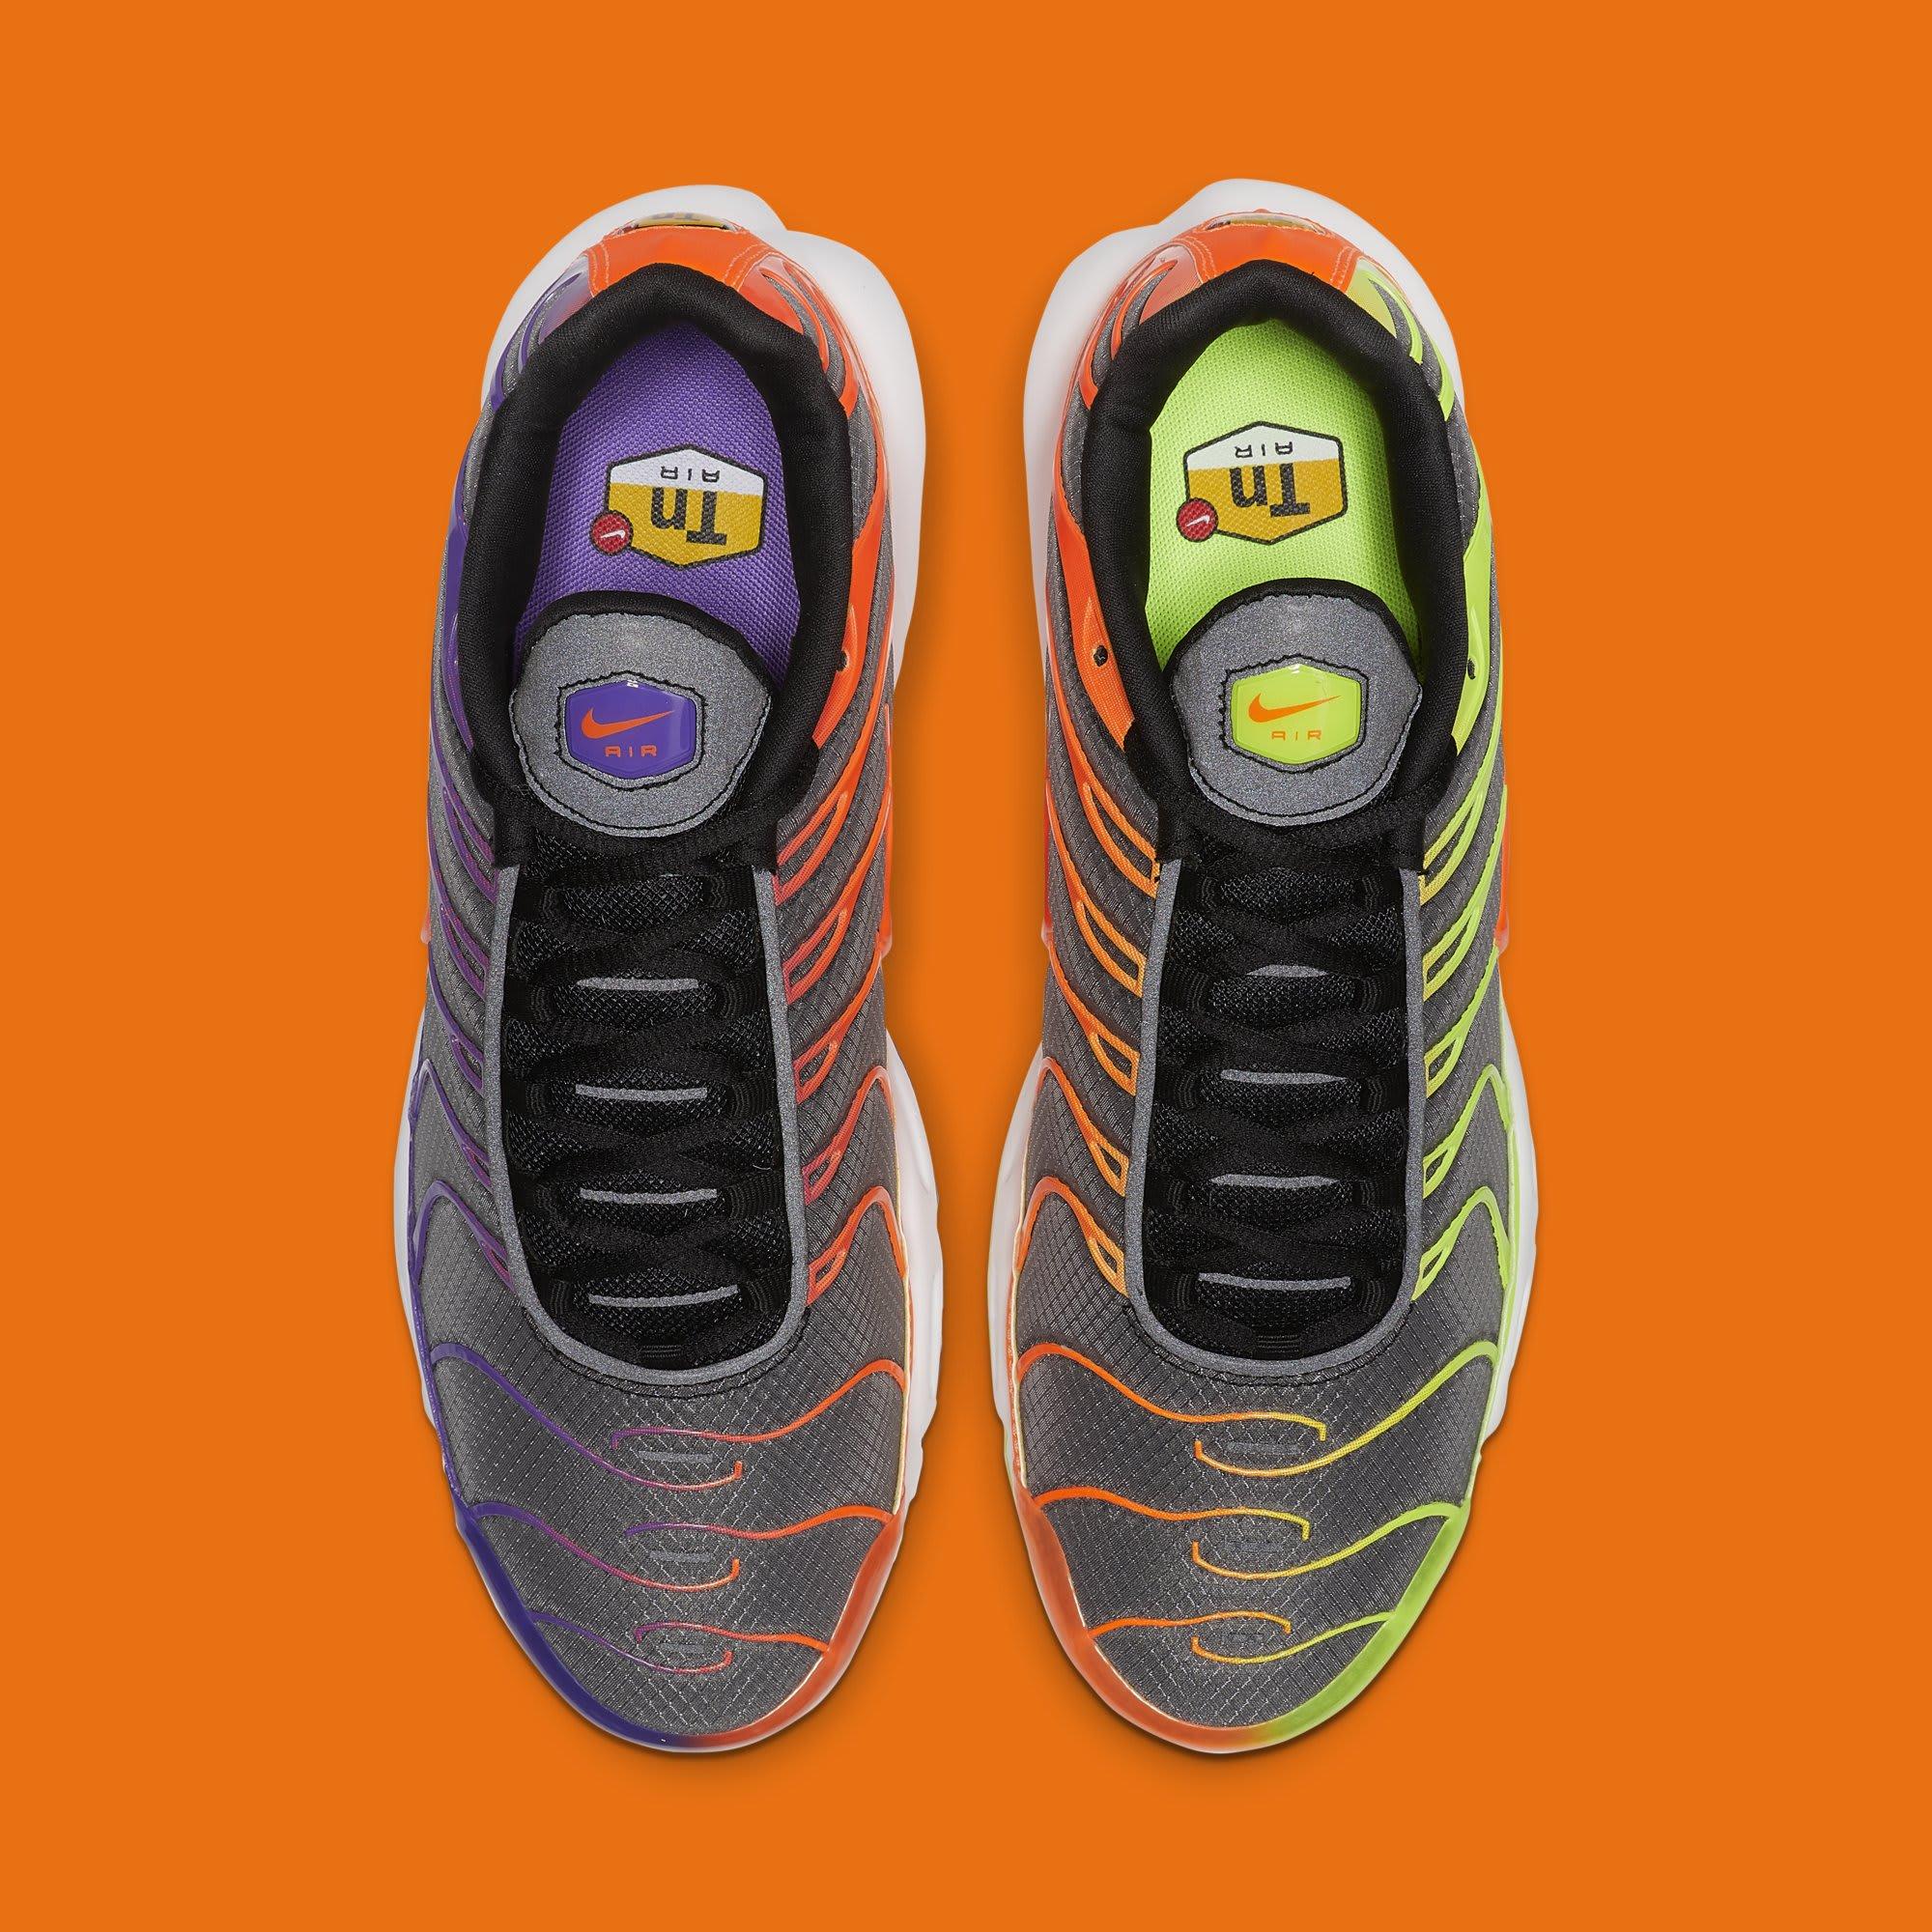 997084db0c Image via Nike Nike Air Max Plus 'Color Flip/Black' CI5924-061 (Top)